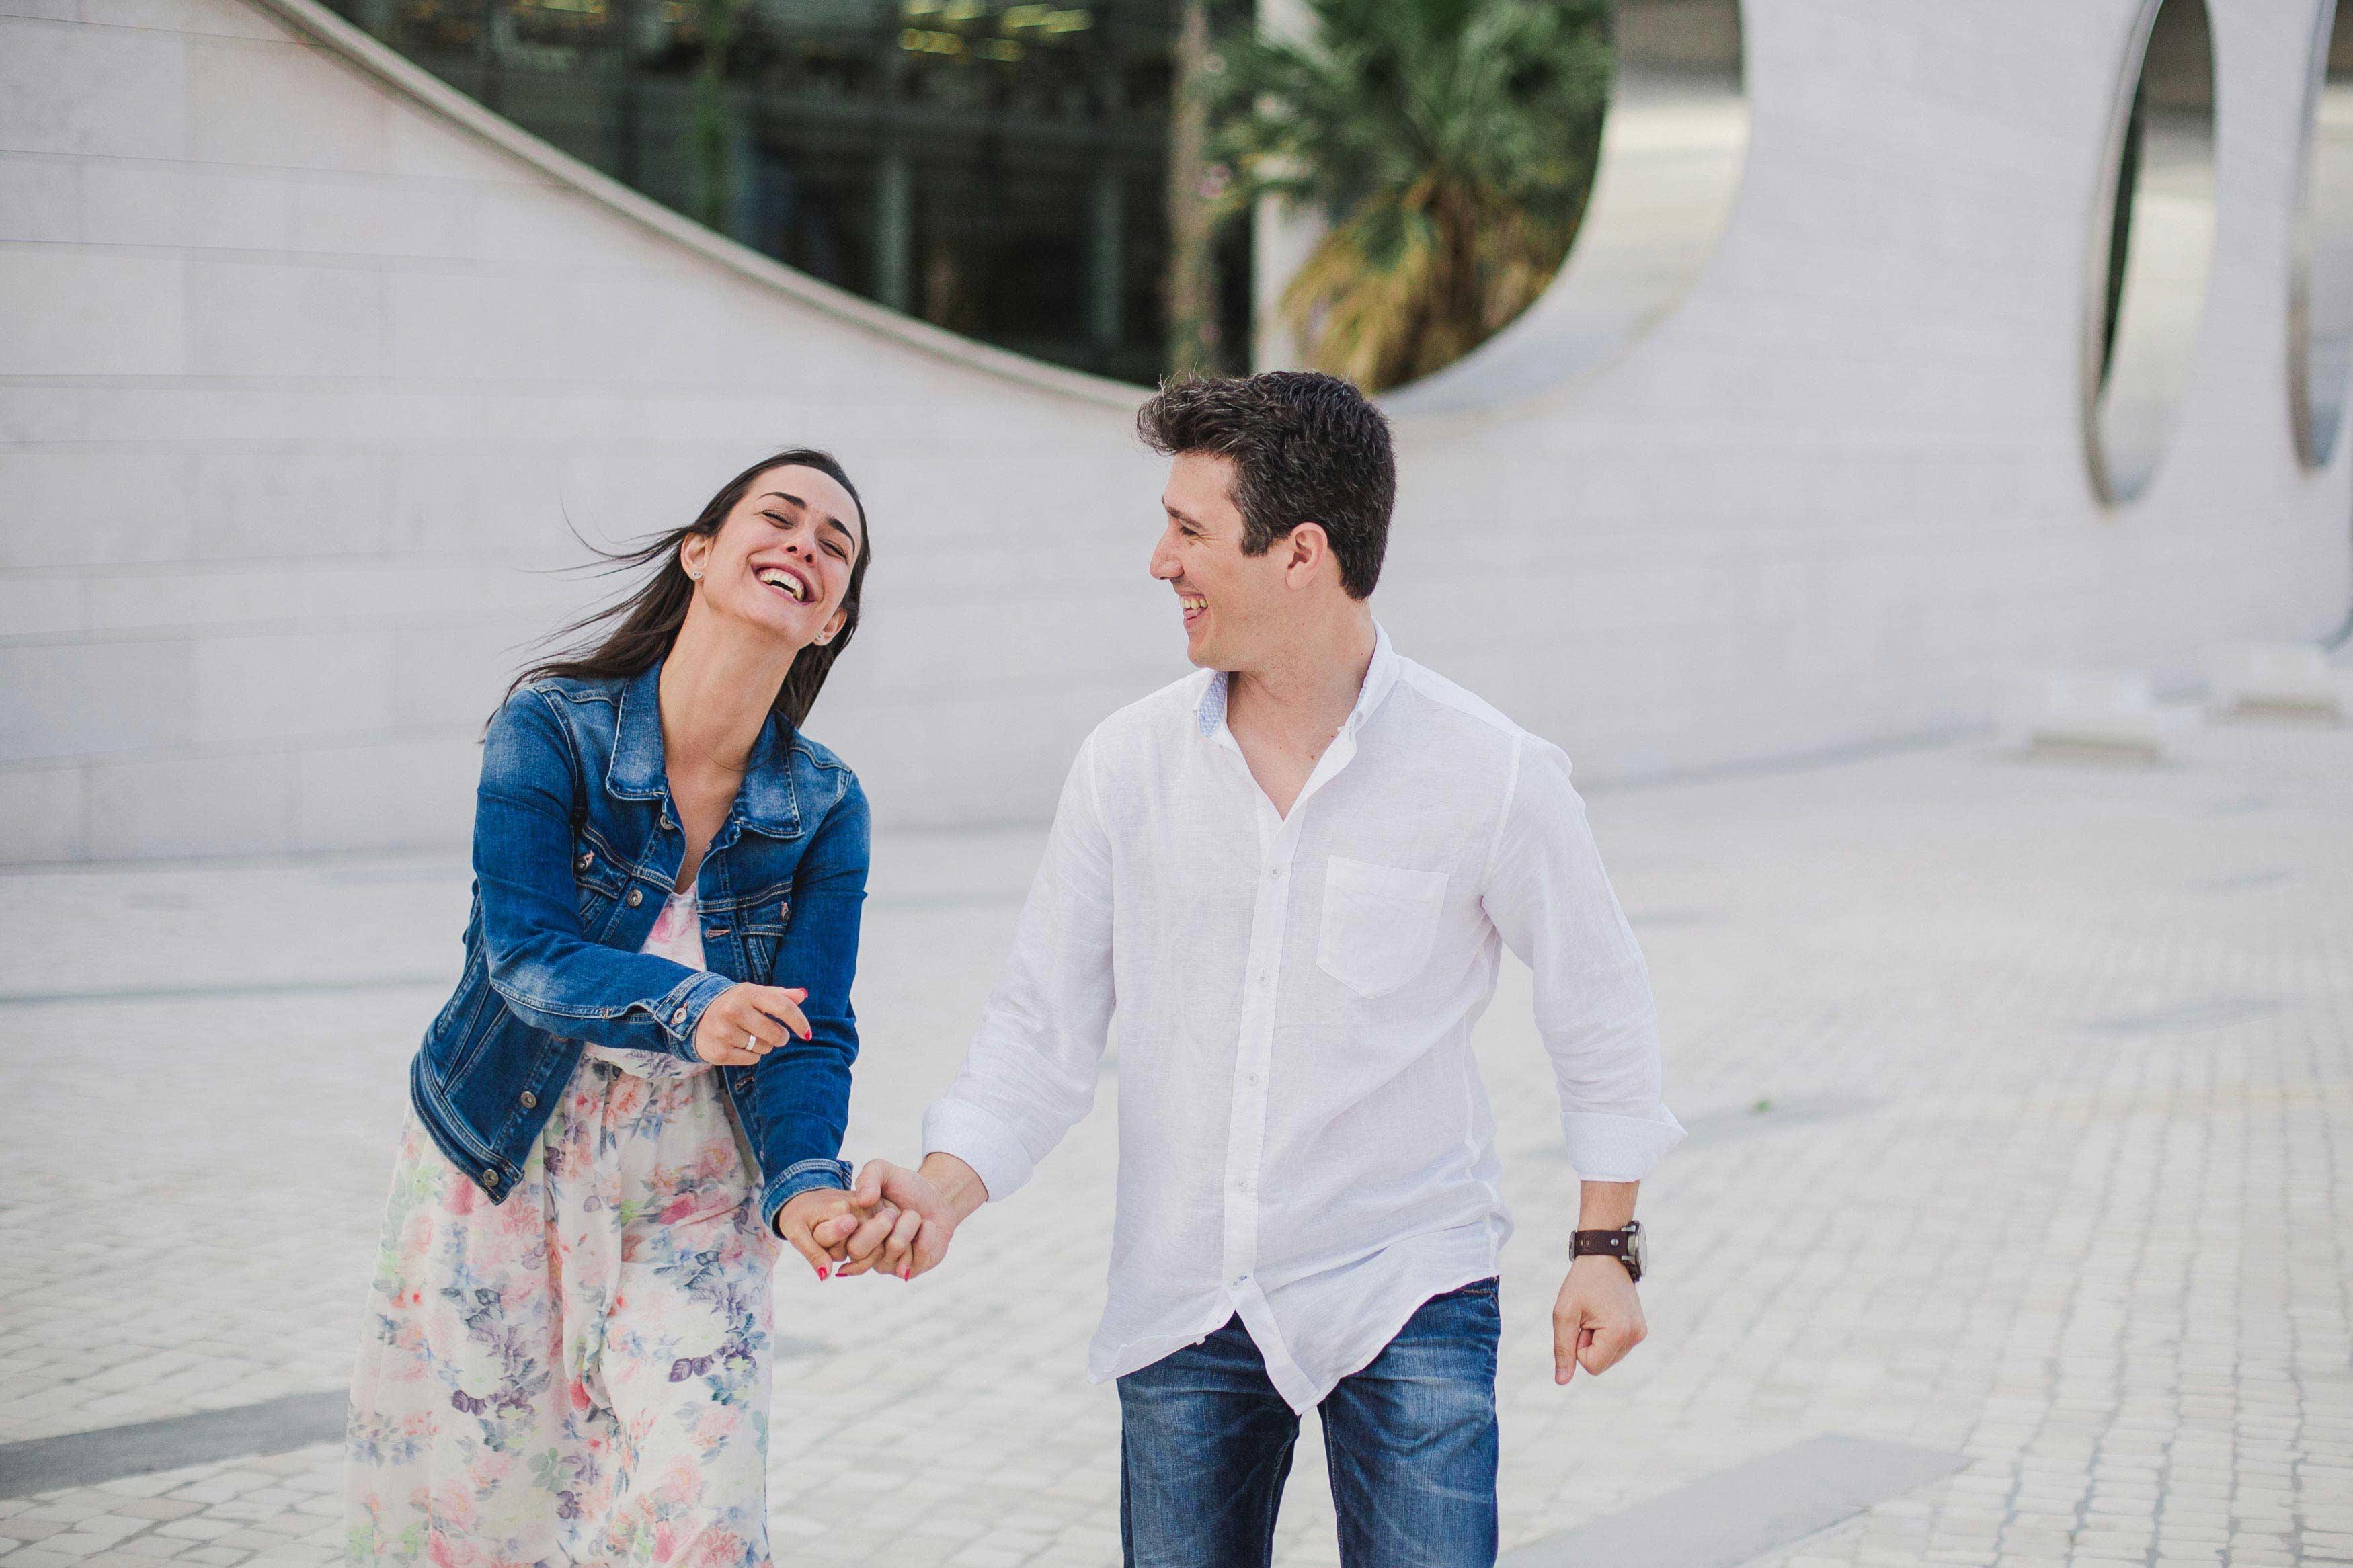 22 engagement-love-session-fundacao-Champalimaud-Filipe-Santiago-Fotografia-Lisboa-Mafra-Malveira-Fotografo